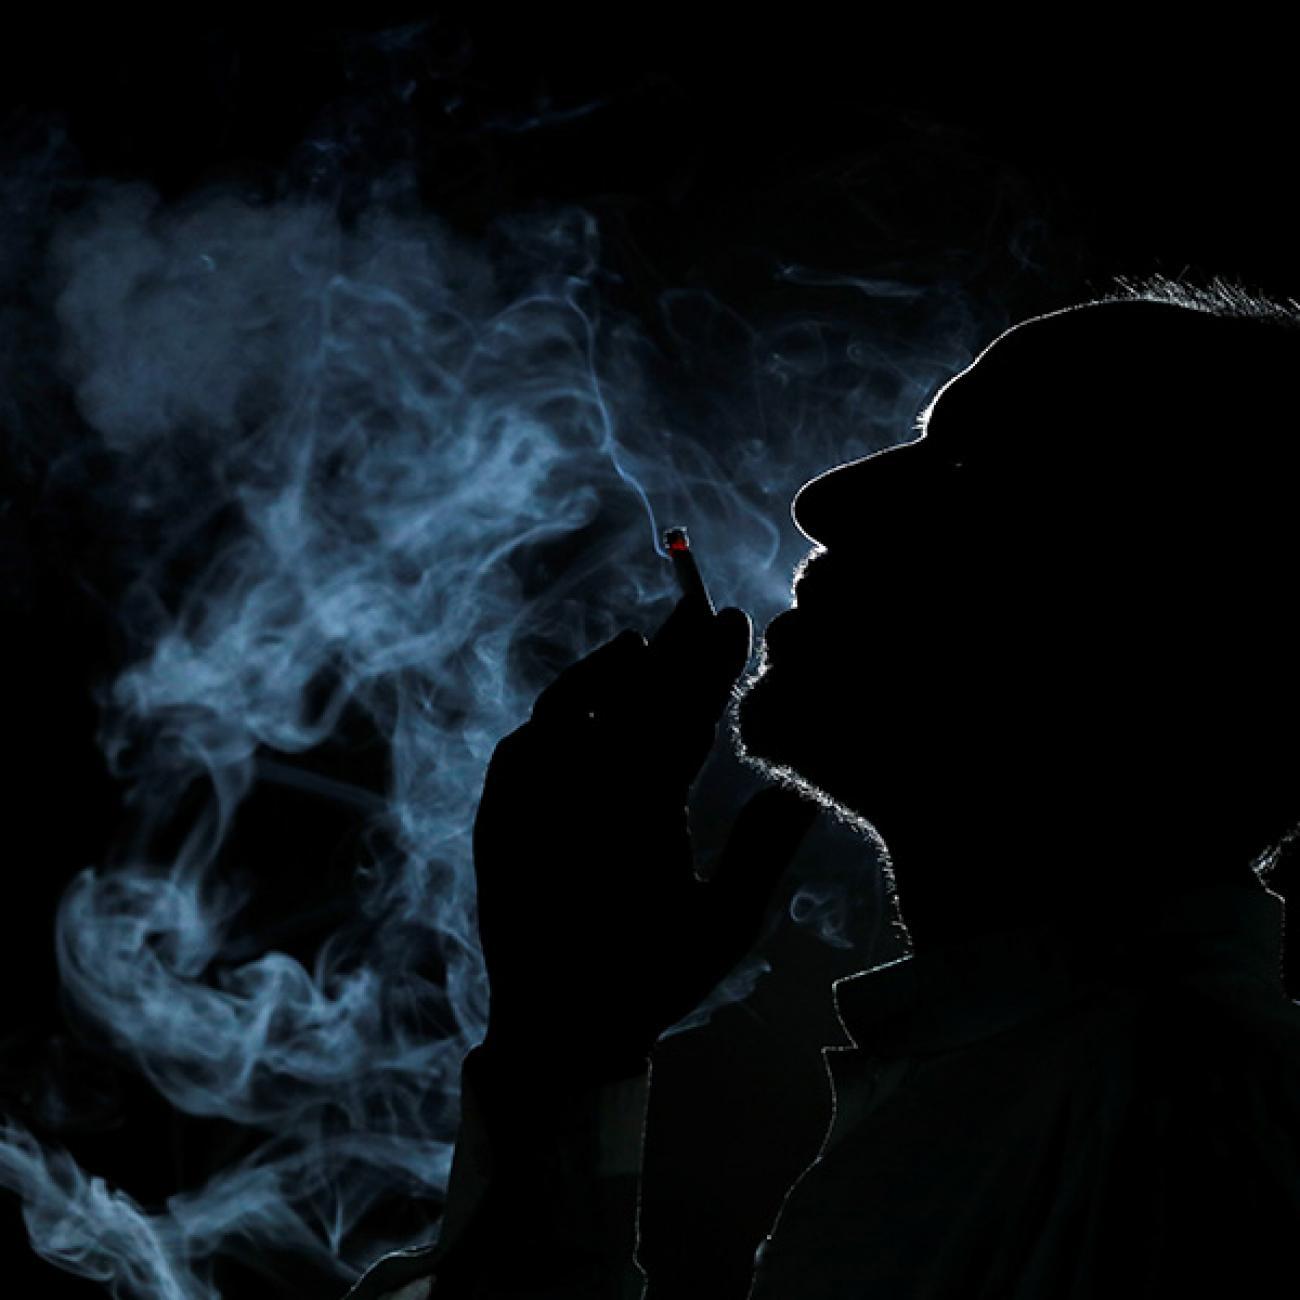 https://www.thinkglobalhealth.org/sites/default/files/styles/max_1300x1300_1_1/public/2020-05/Bungon.Ritthiphakdee-Tobacco-Bangladesh-5.13.20-RTX6WWRE-SQUARE.jpg?itok=jBrCIF2A